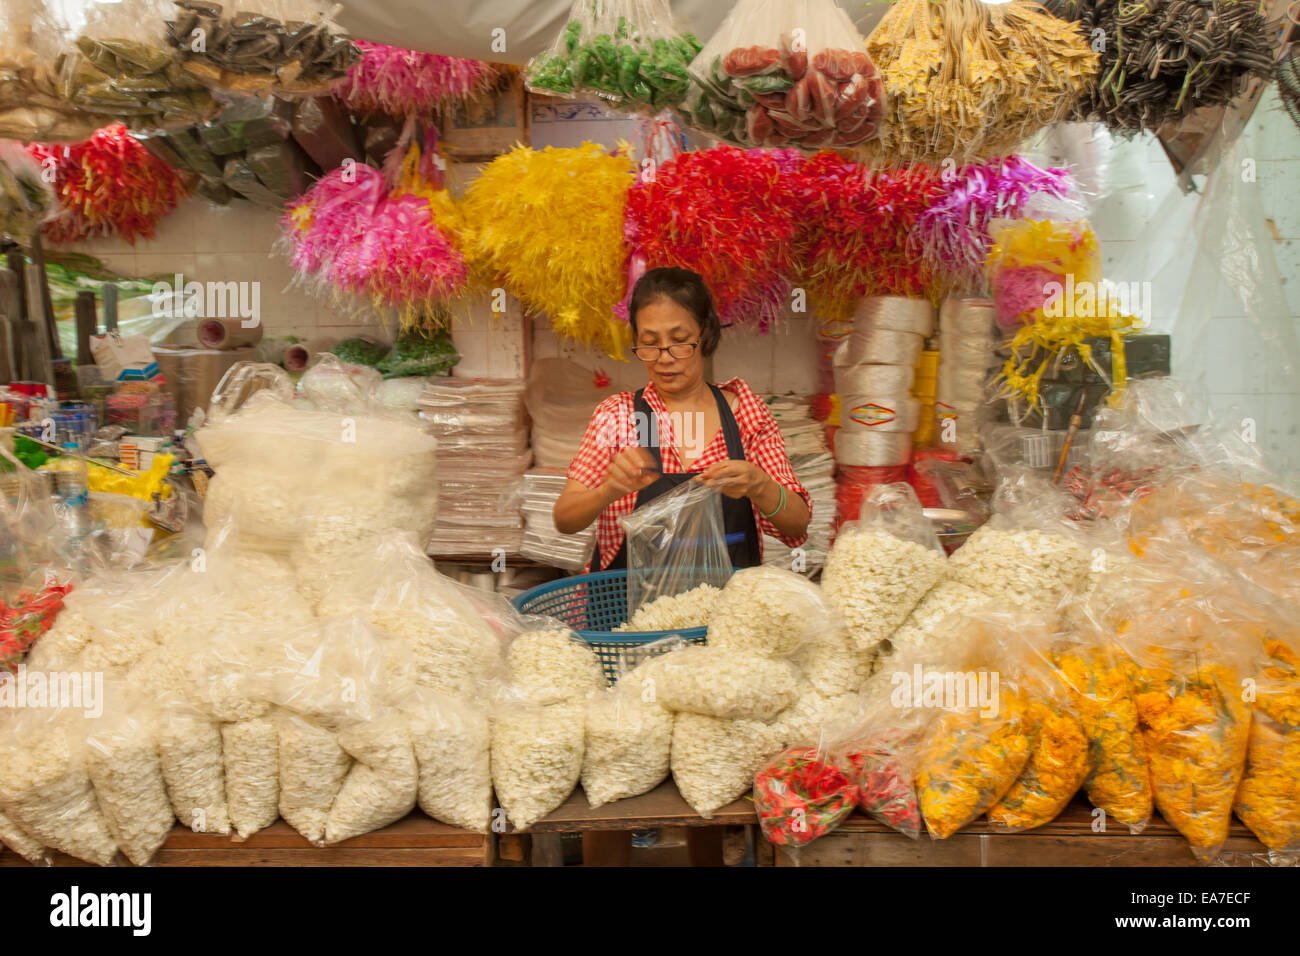 Flower Market in Bangkok, Thailand - Stock Image